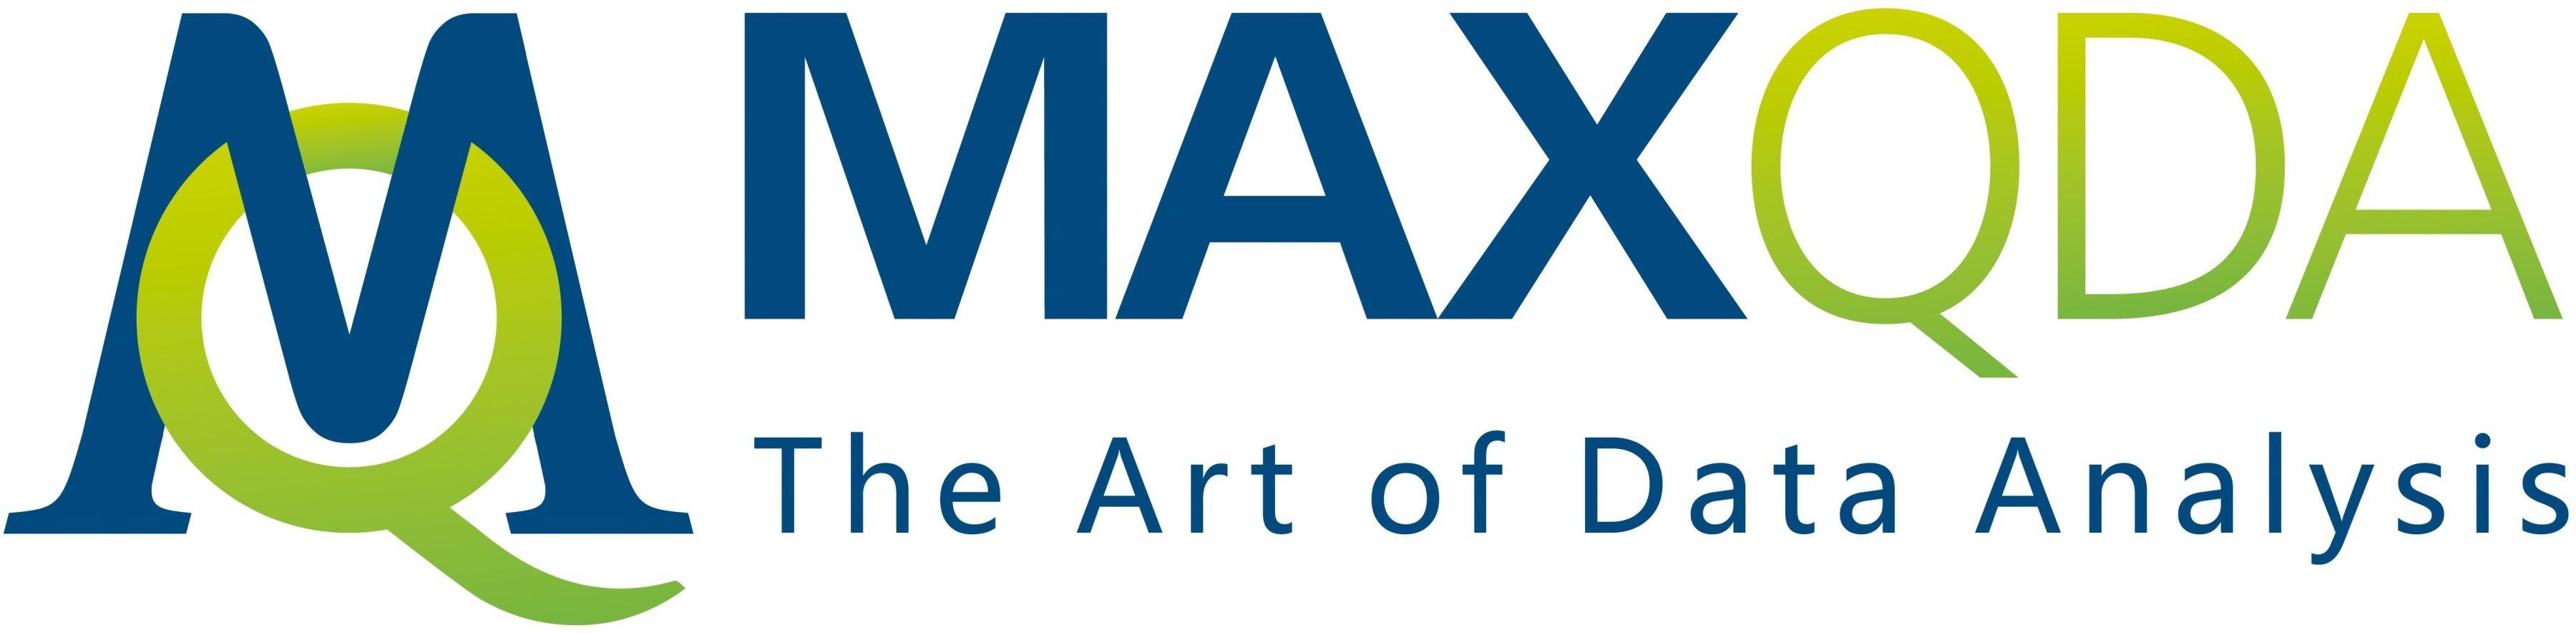 MAXQDA Analytics Pro - Użytkownik Indywidualny - Certyfikaty Rzetelna Firma i Adobe Gold Reseller